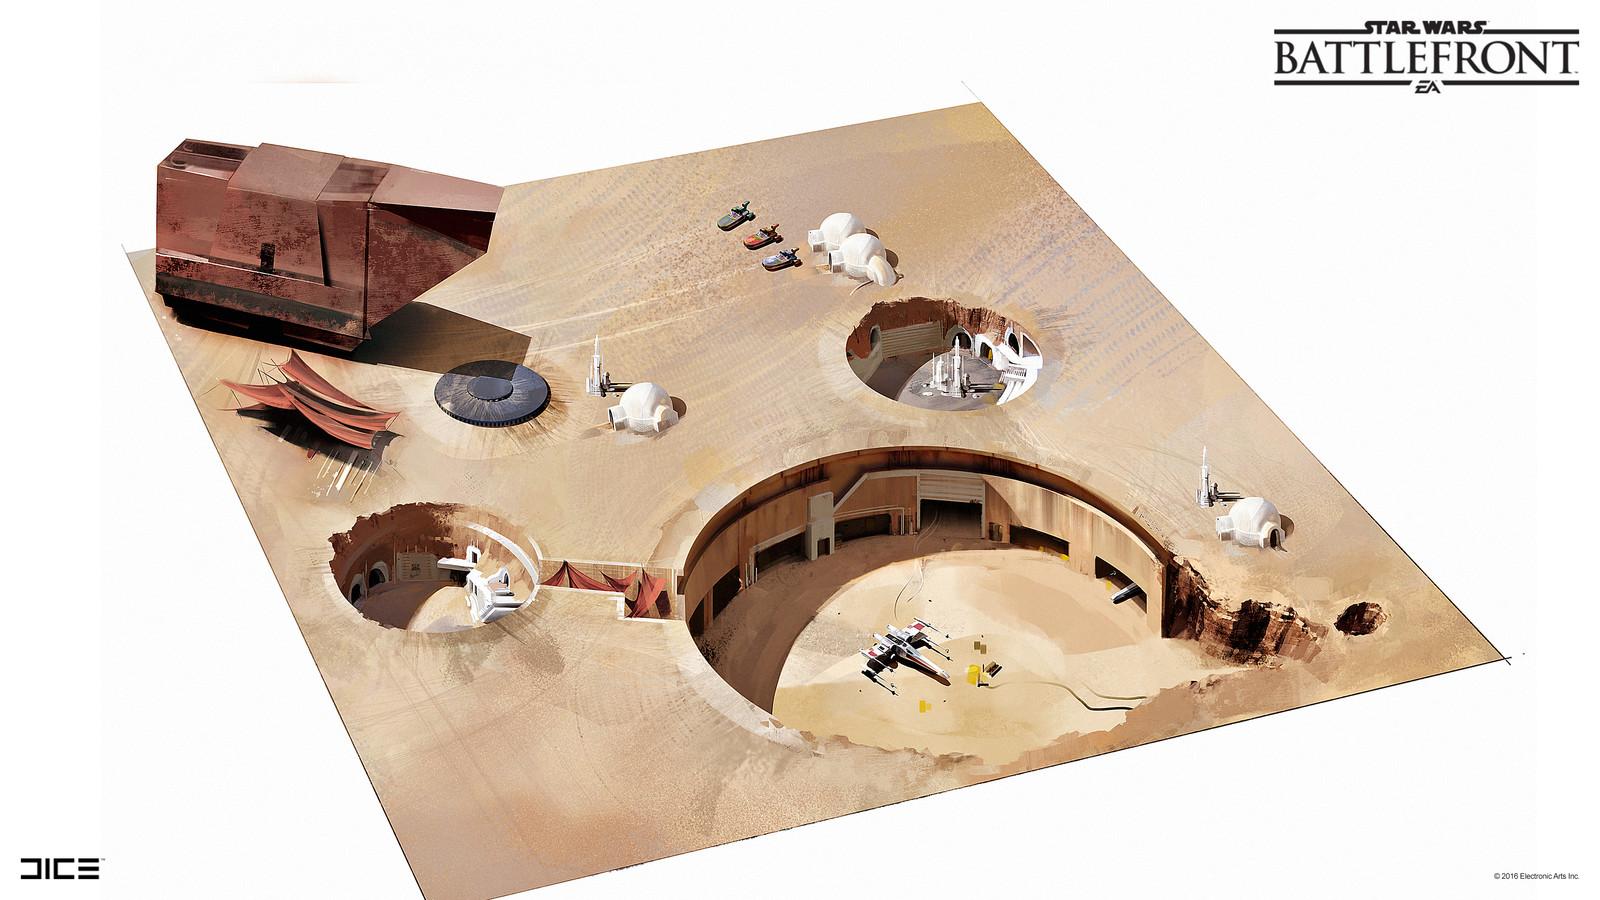 Tatooine Concept Art for the 2015 Star Wars Battlefront game. (2014)